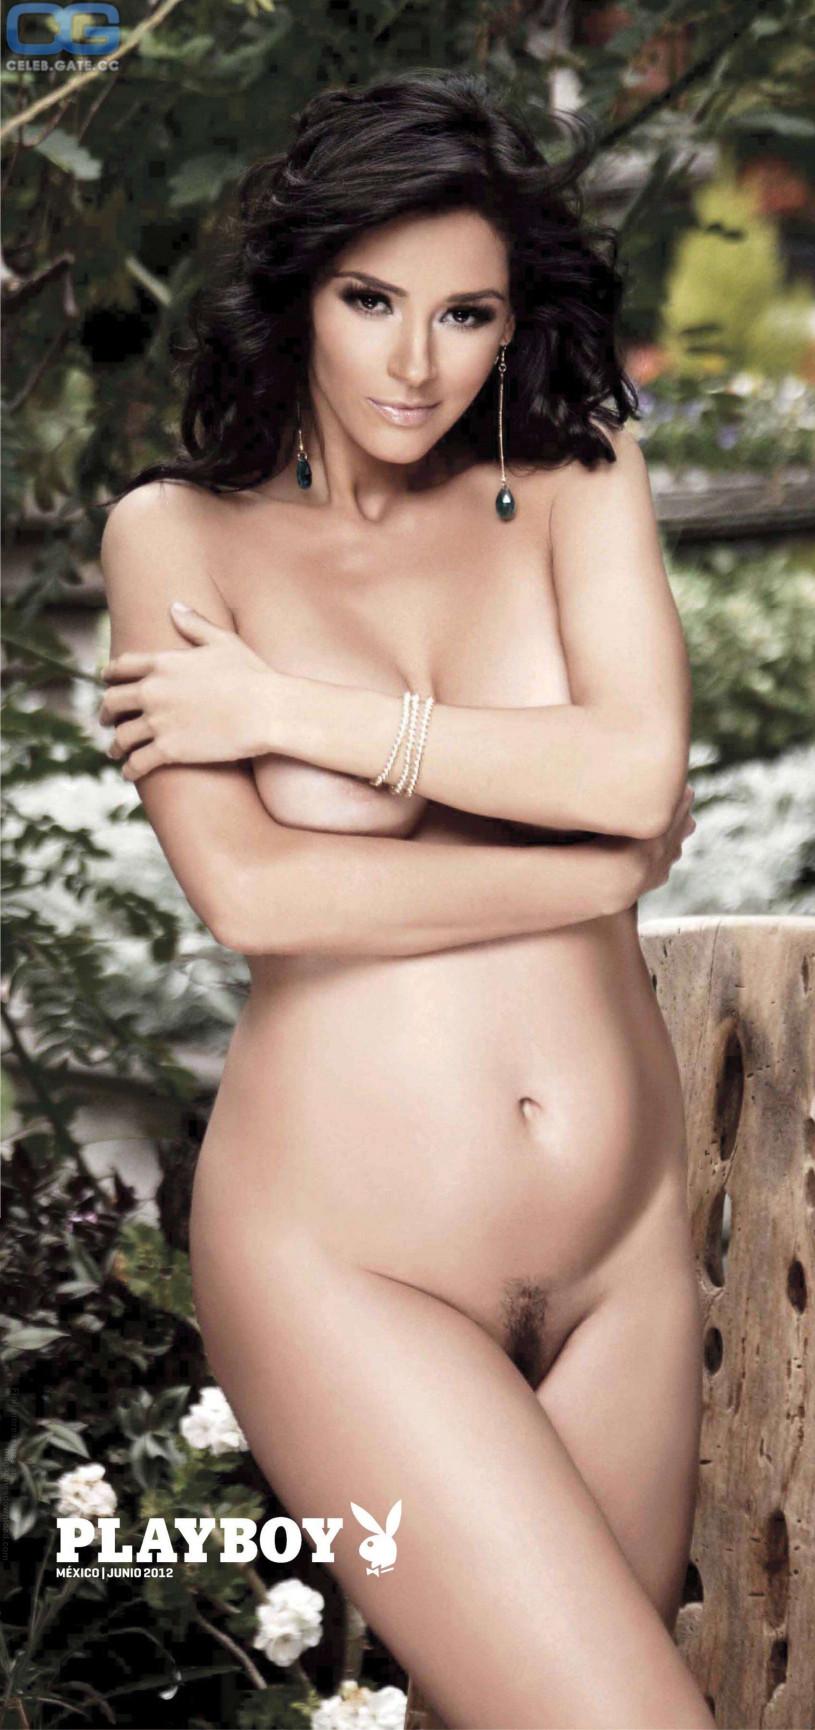 Doris Mar Naked Great dorismar nude, pictures, photos, playboy, naked, topless, fappening